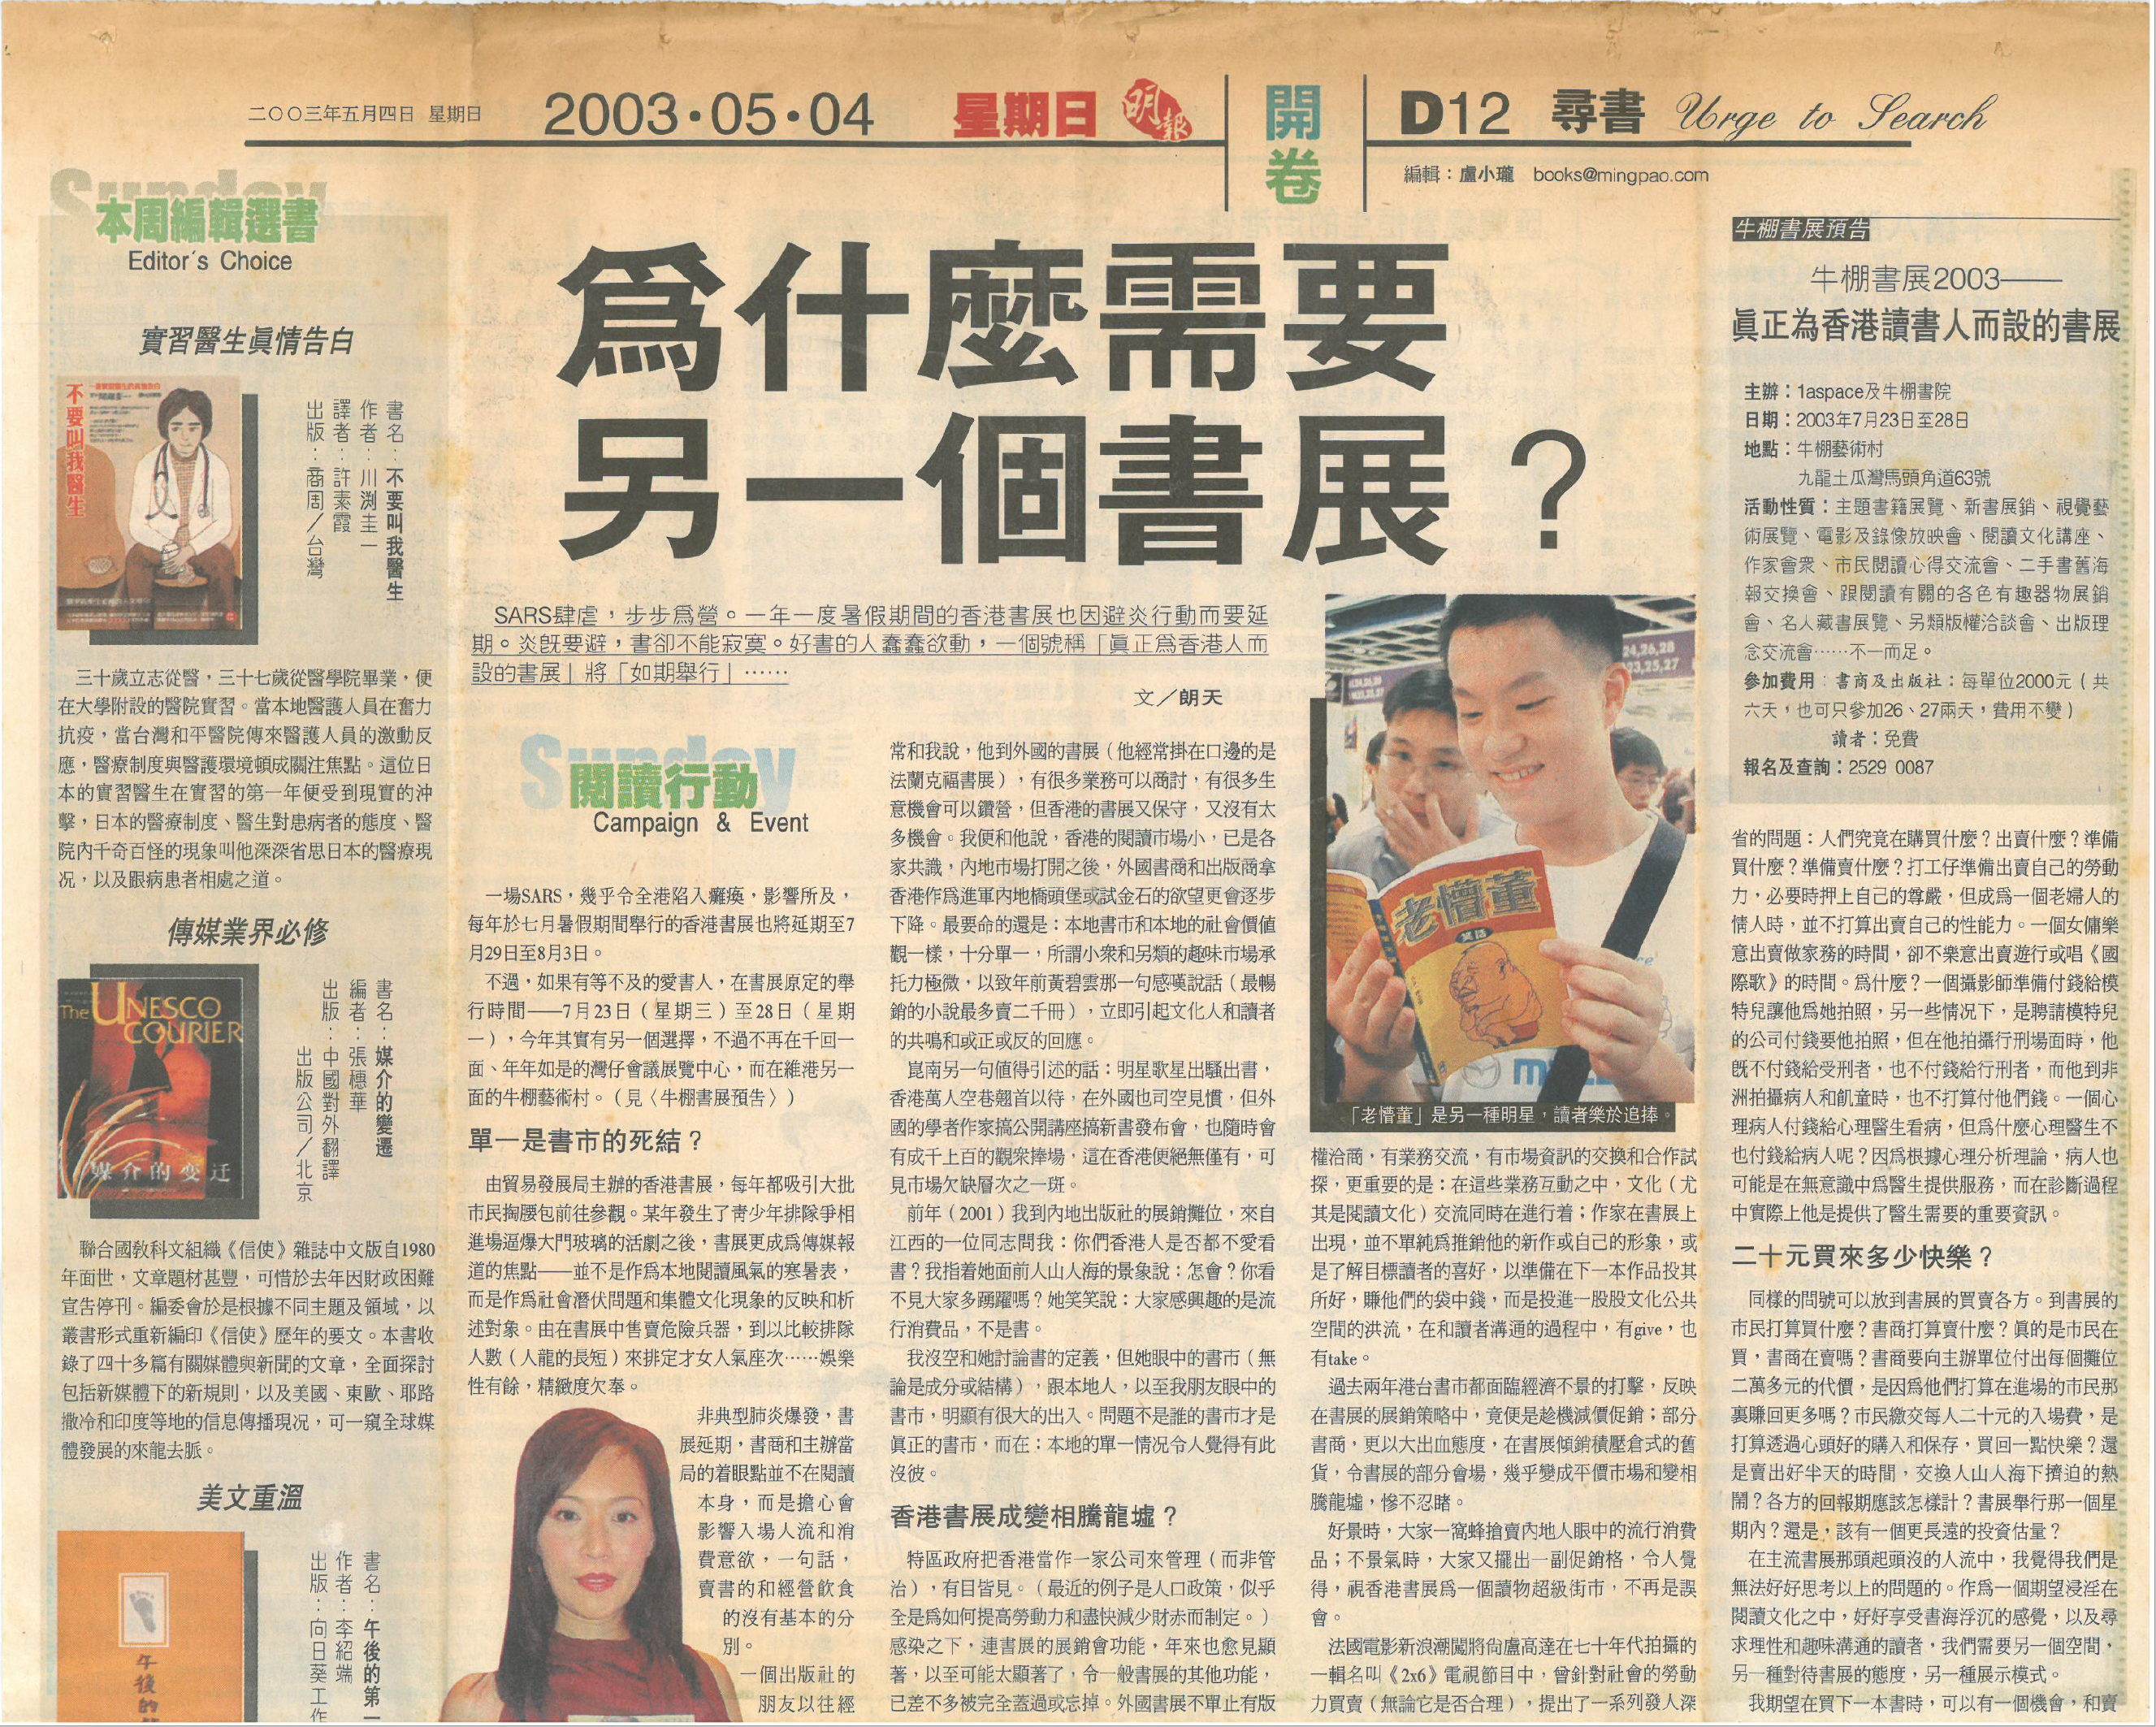 牛棚書展 2003-mingpao